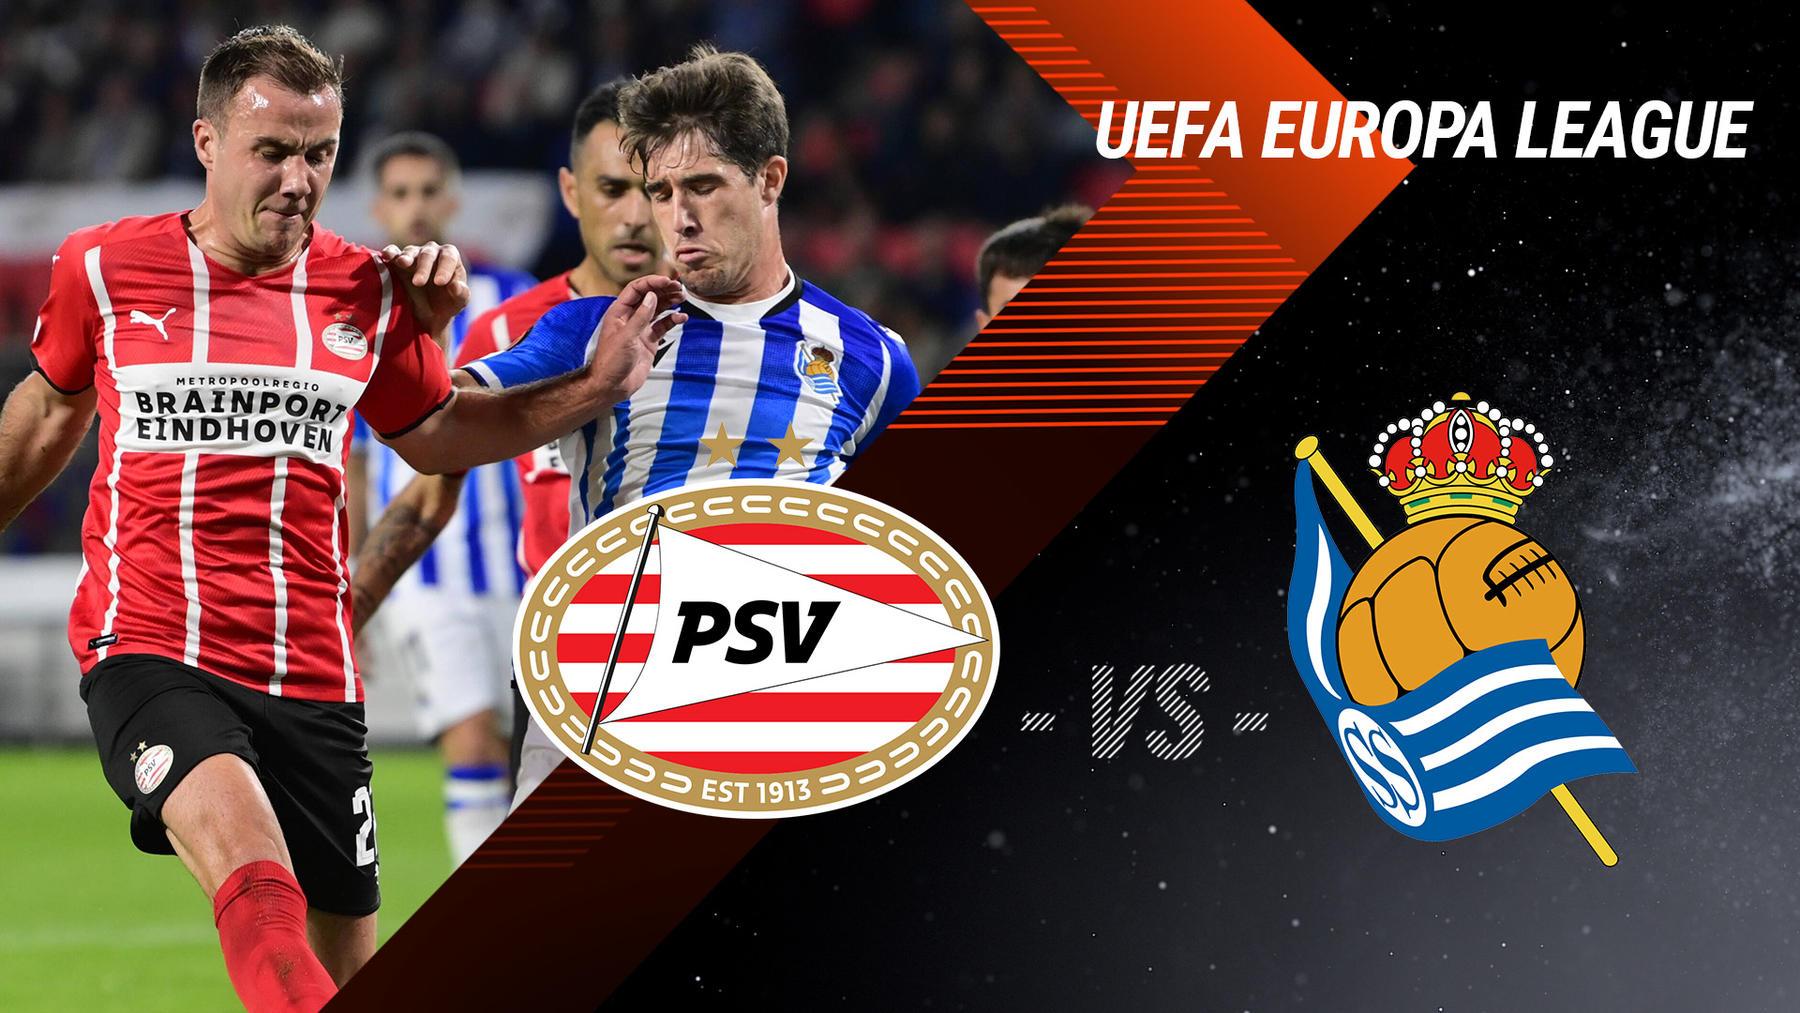 Highlights: PSV Eindhoven vs. Real Sociedad San Sebastian   Folge 5